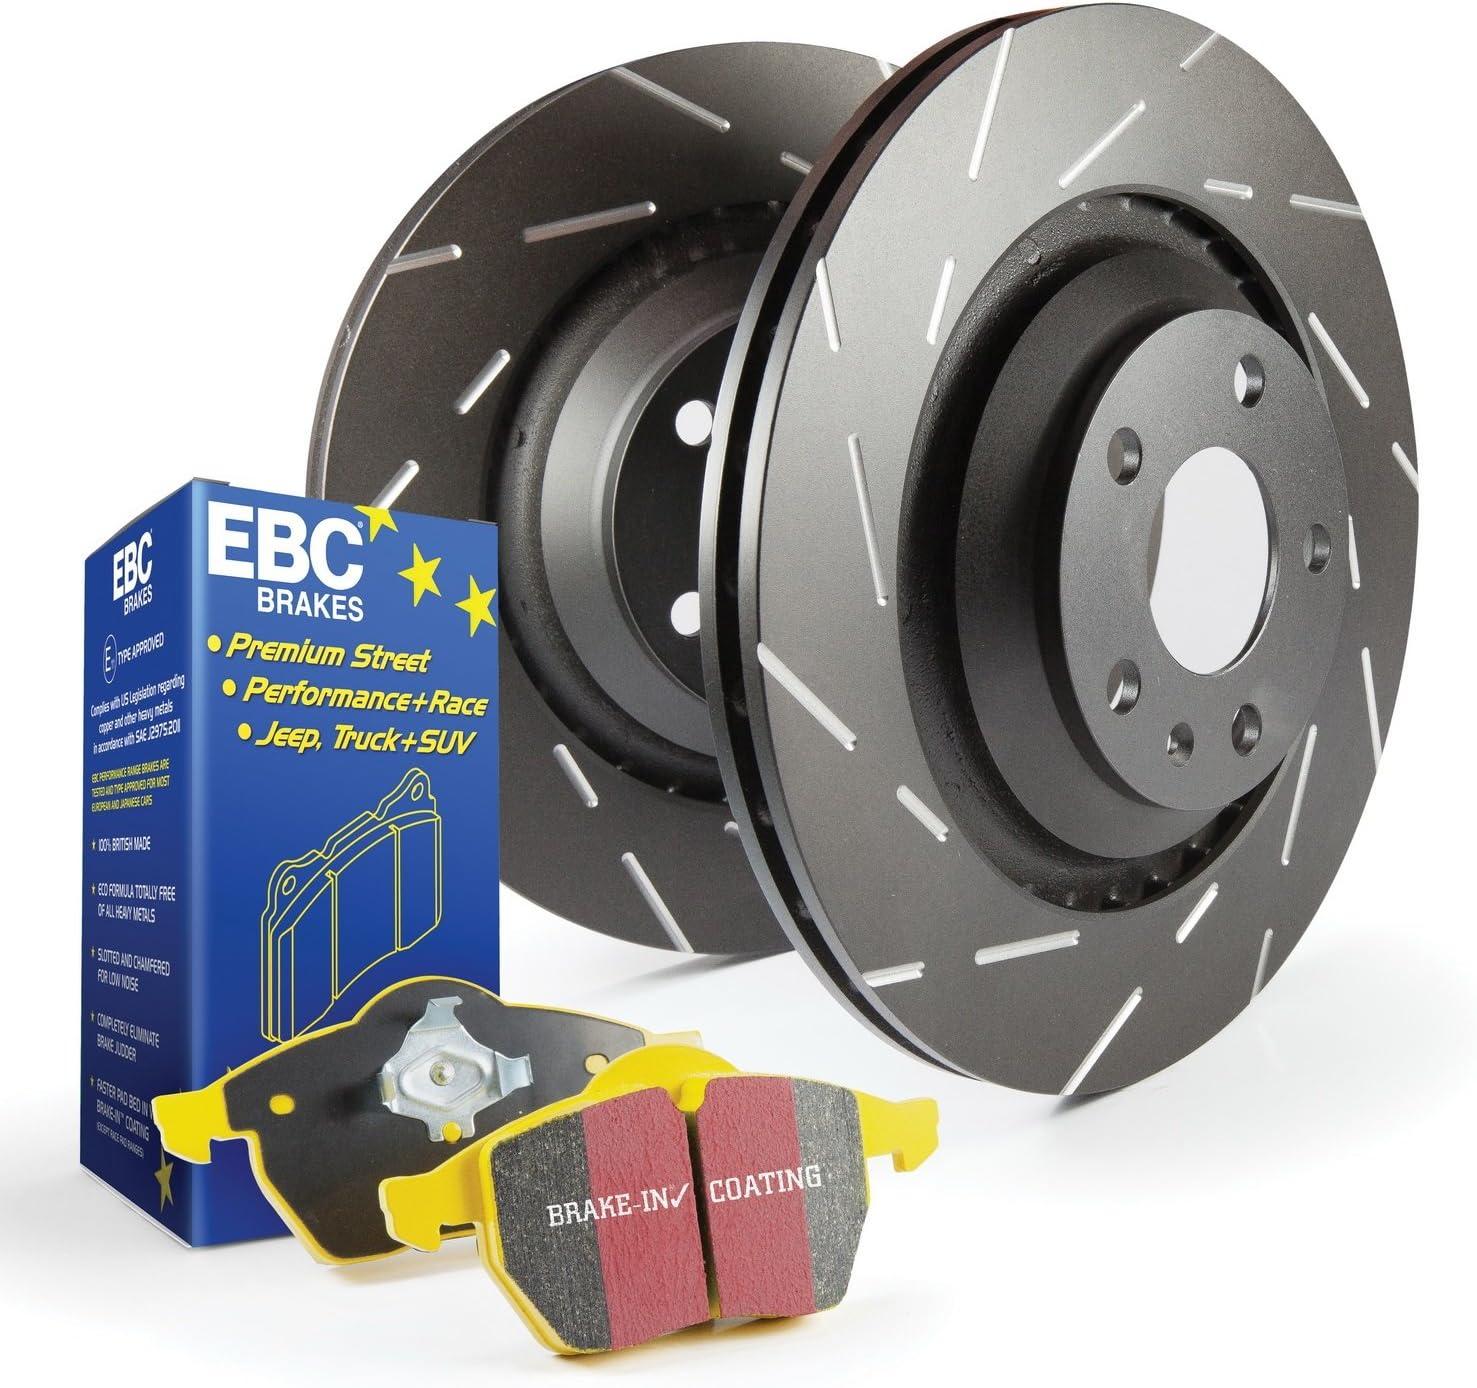 EBC S9KF1777 Kit Max 53% 55% OFF OFF Brake